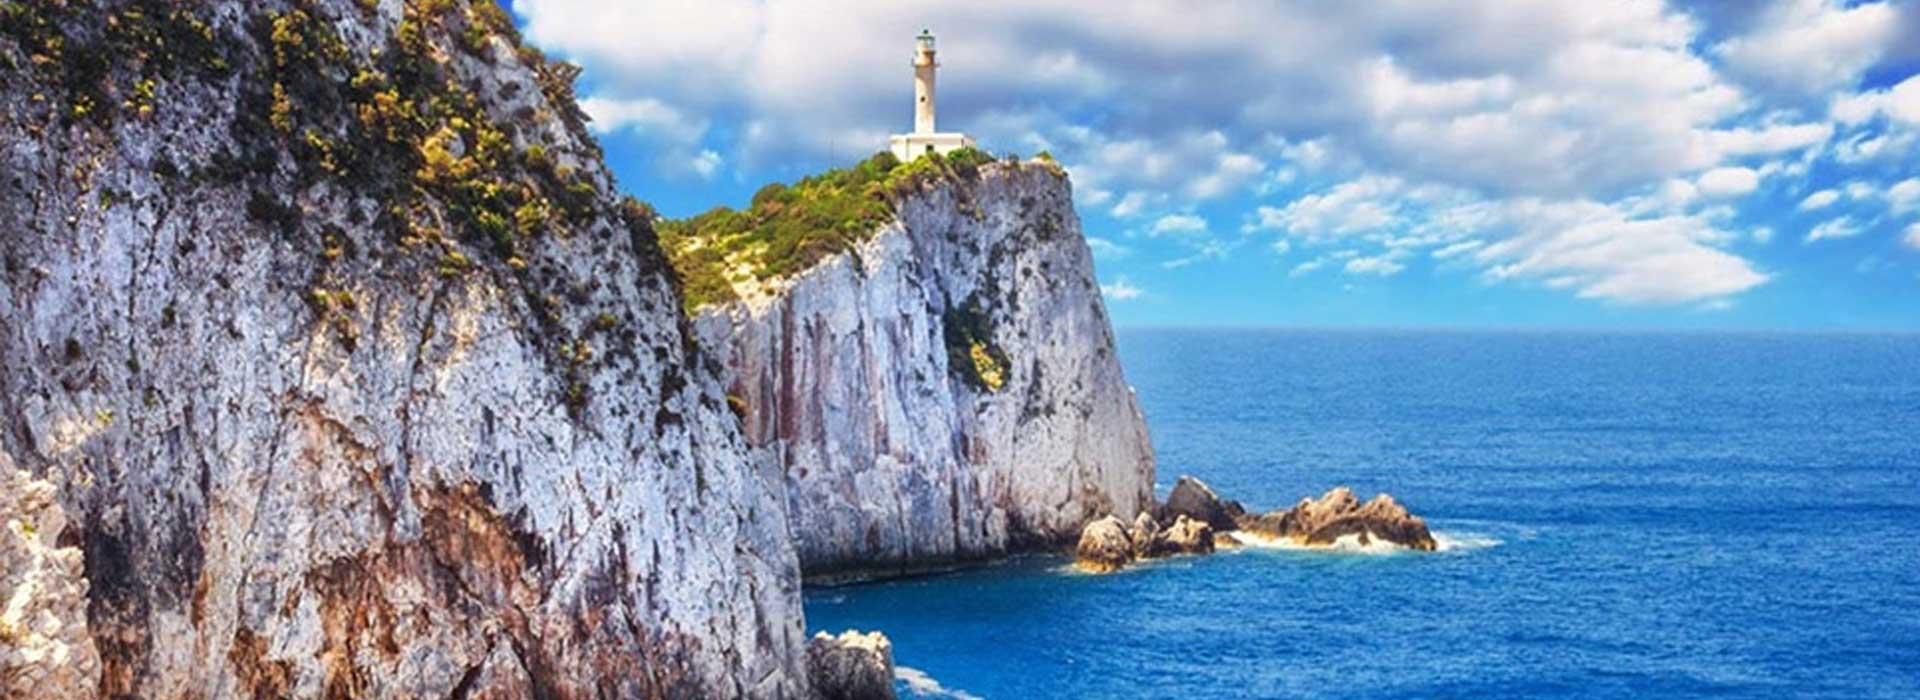 Caribbean of Greece